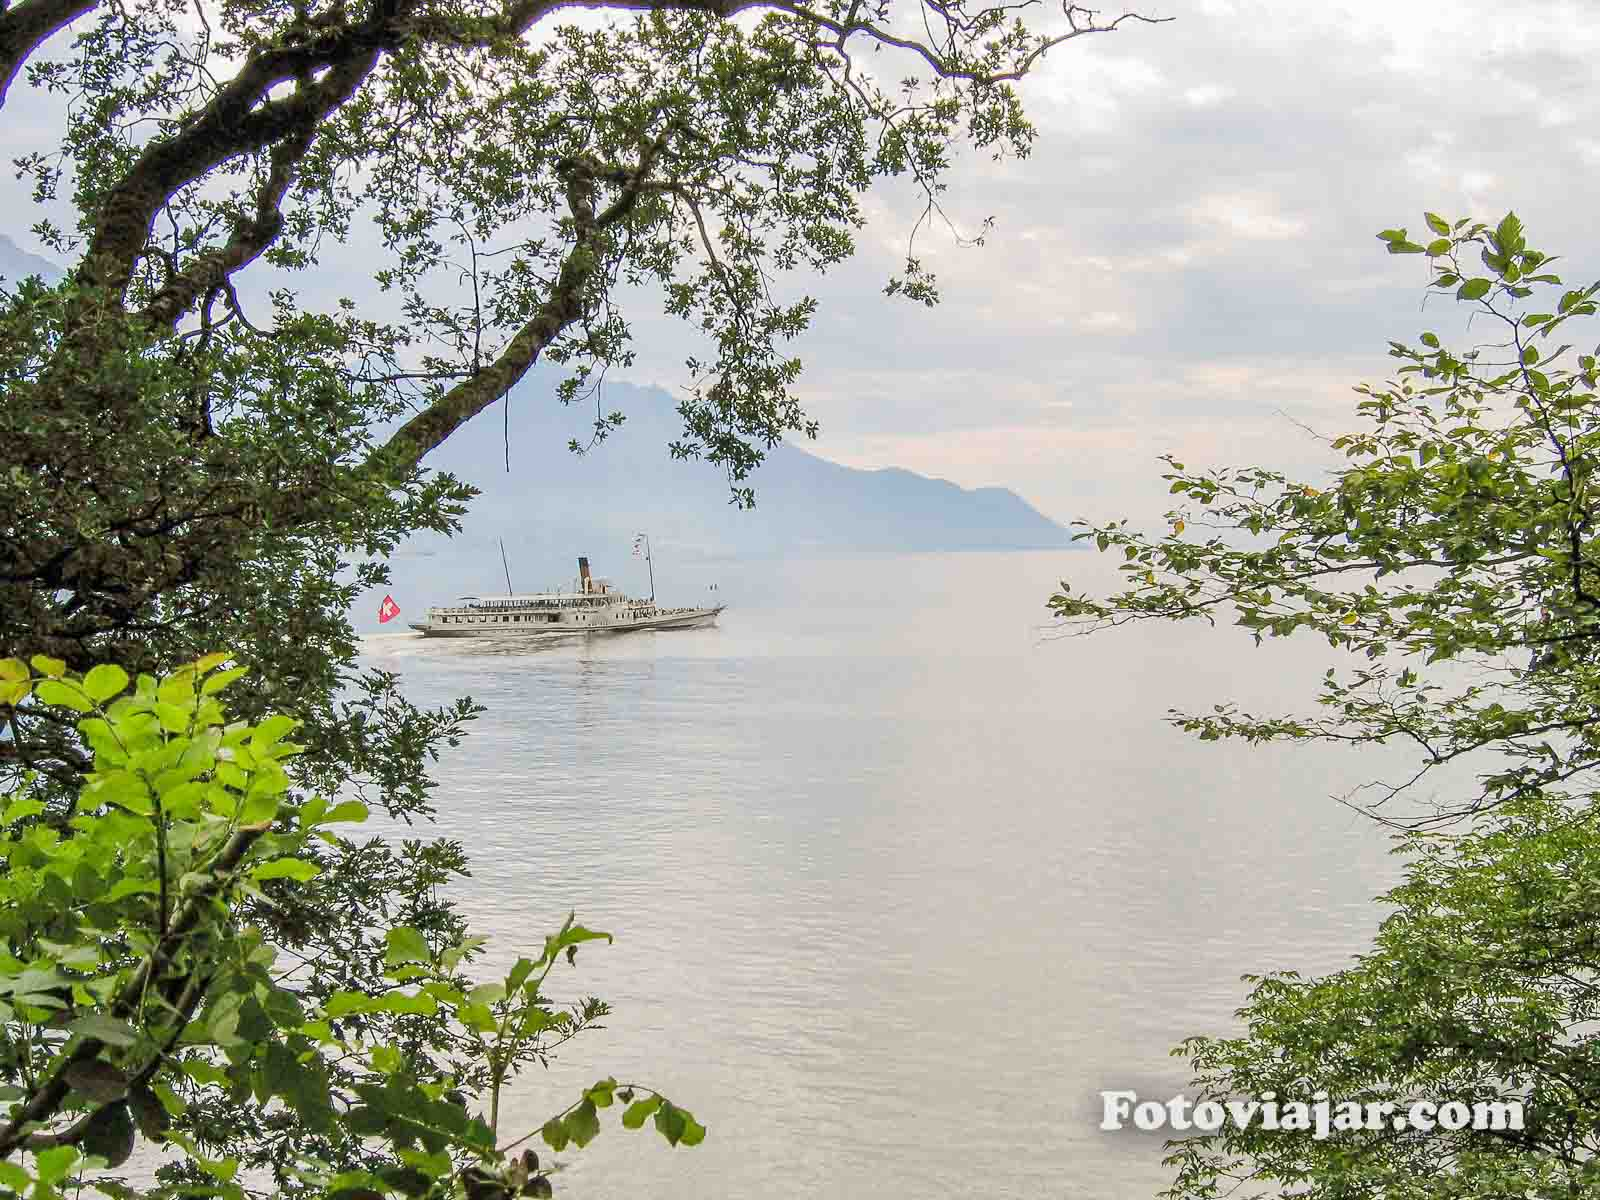 lago genebra viagem europa